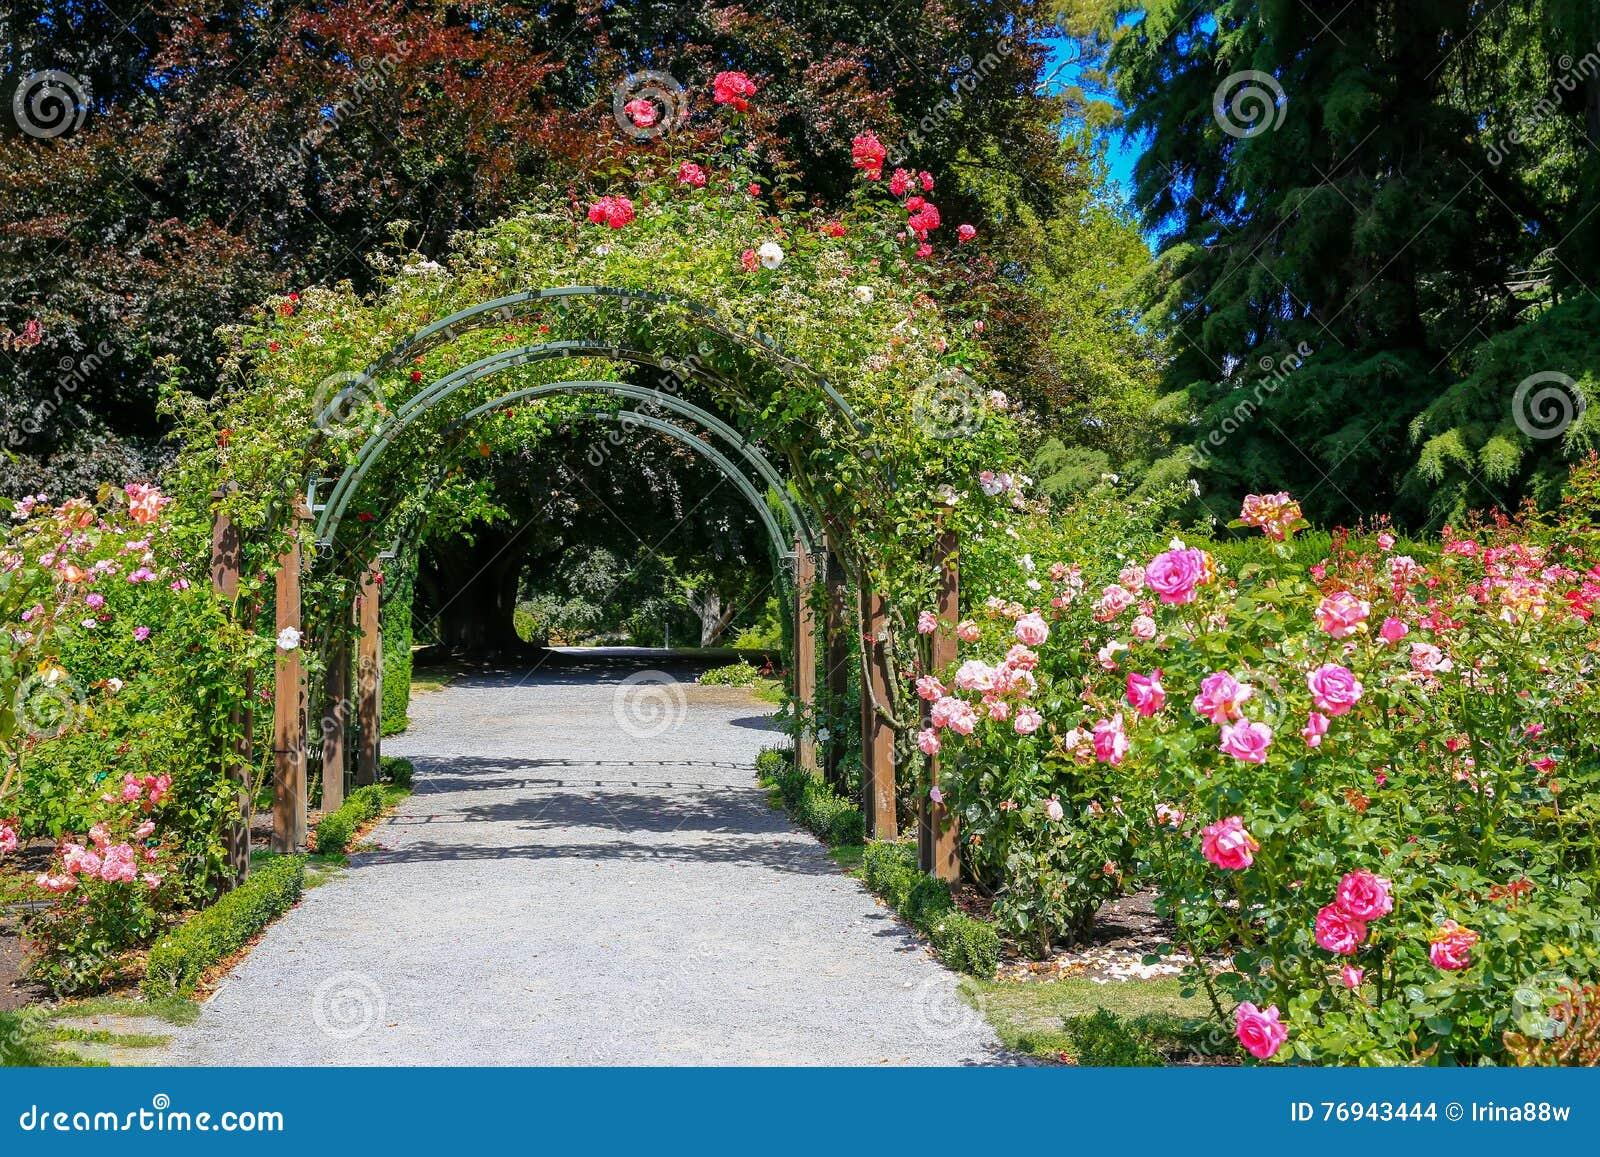 Roses In Garden: Rose Garden In Christchurch Botanic Garden, New Zealand